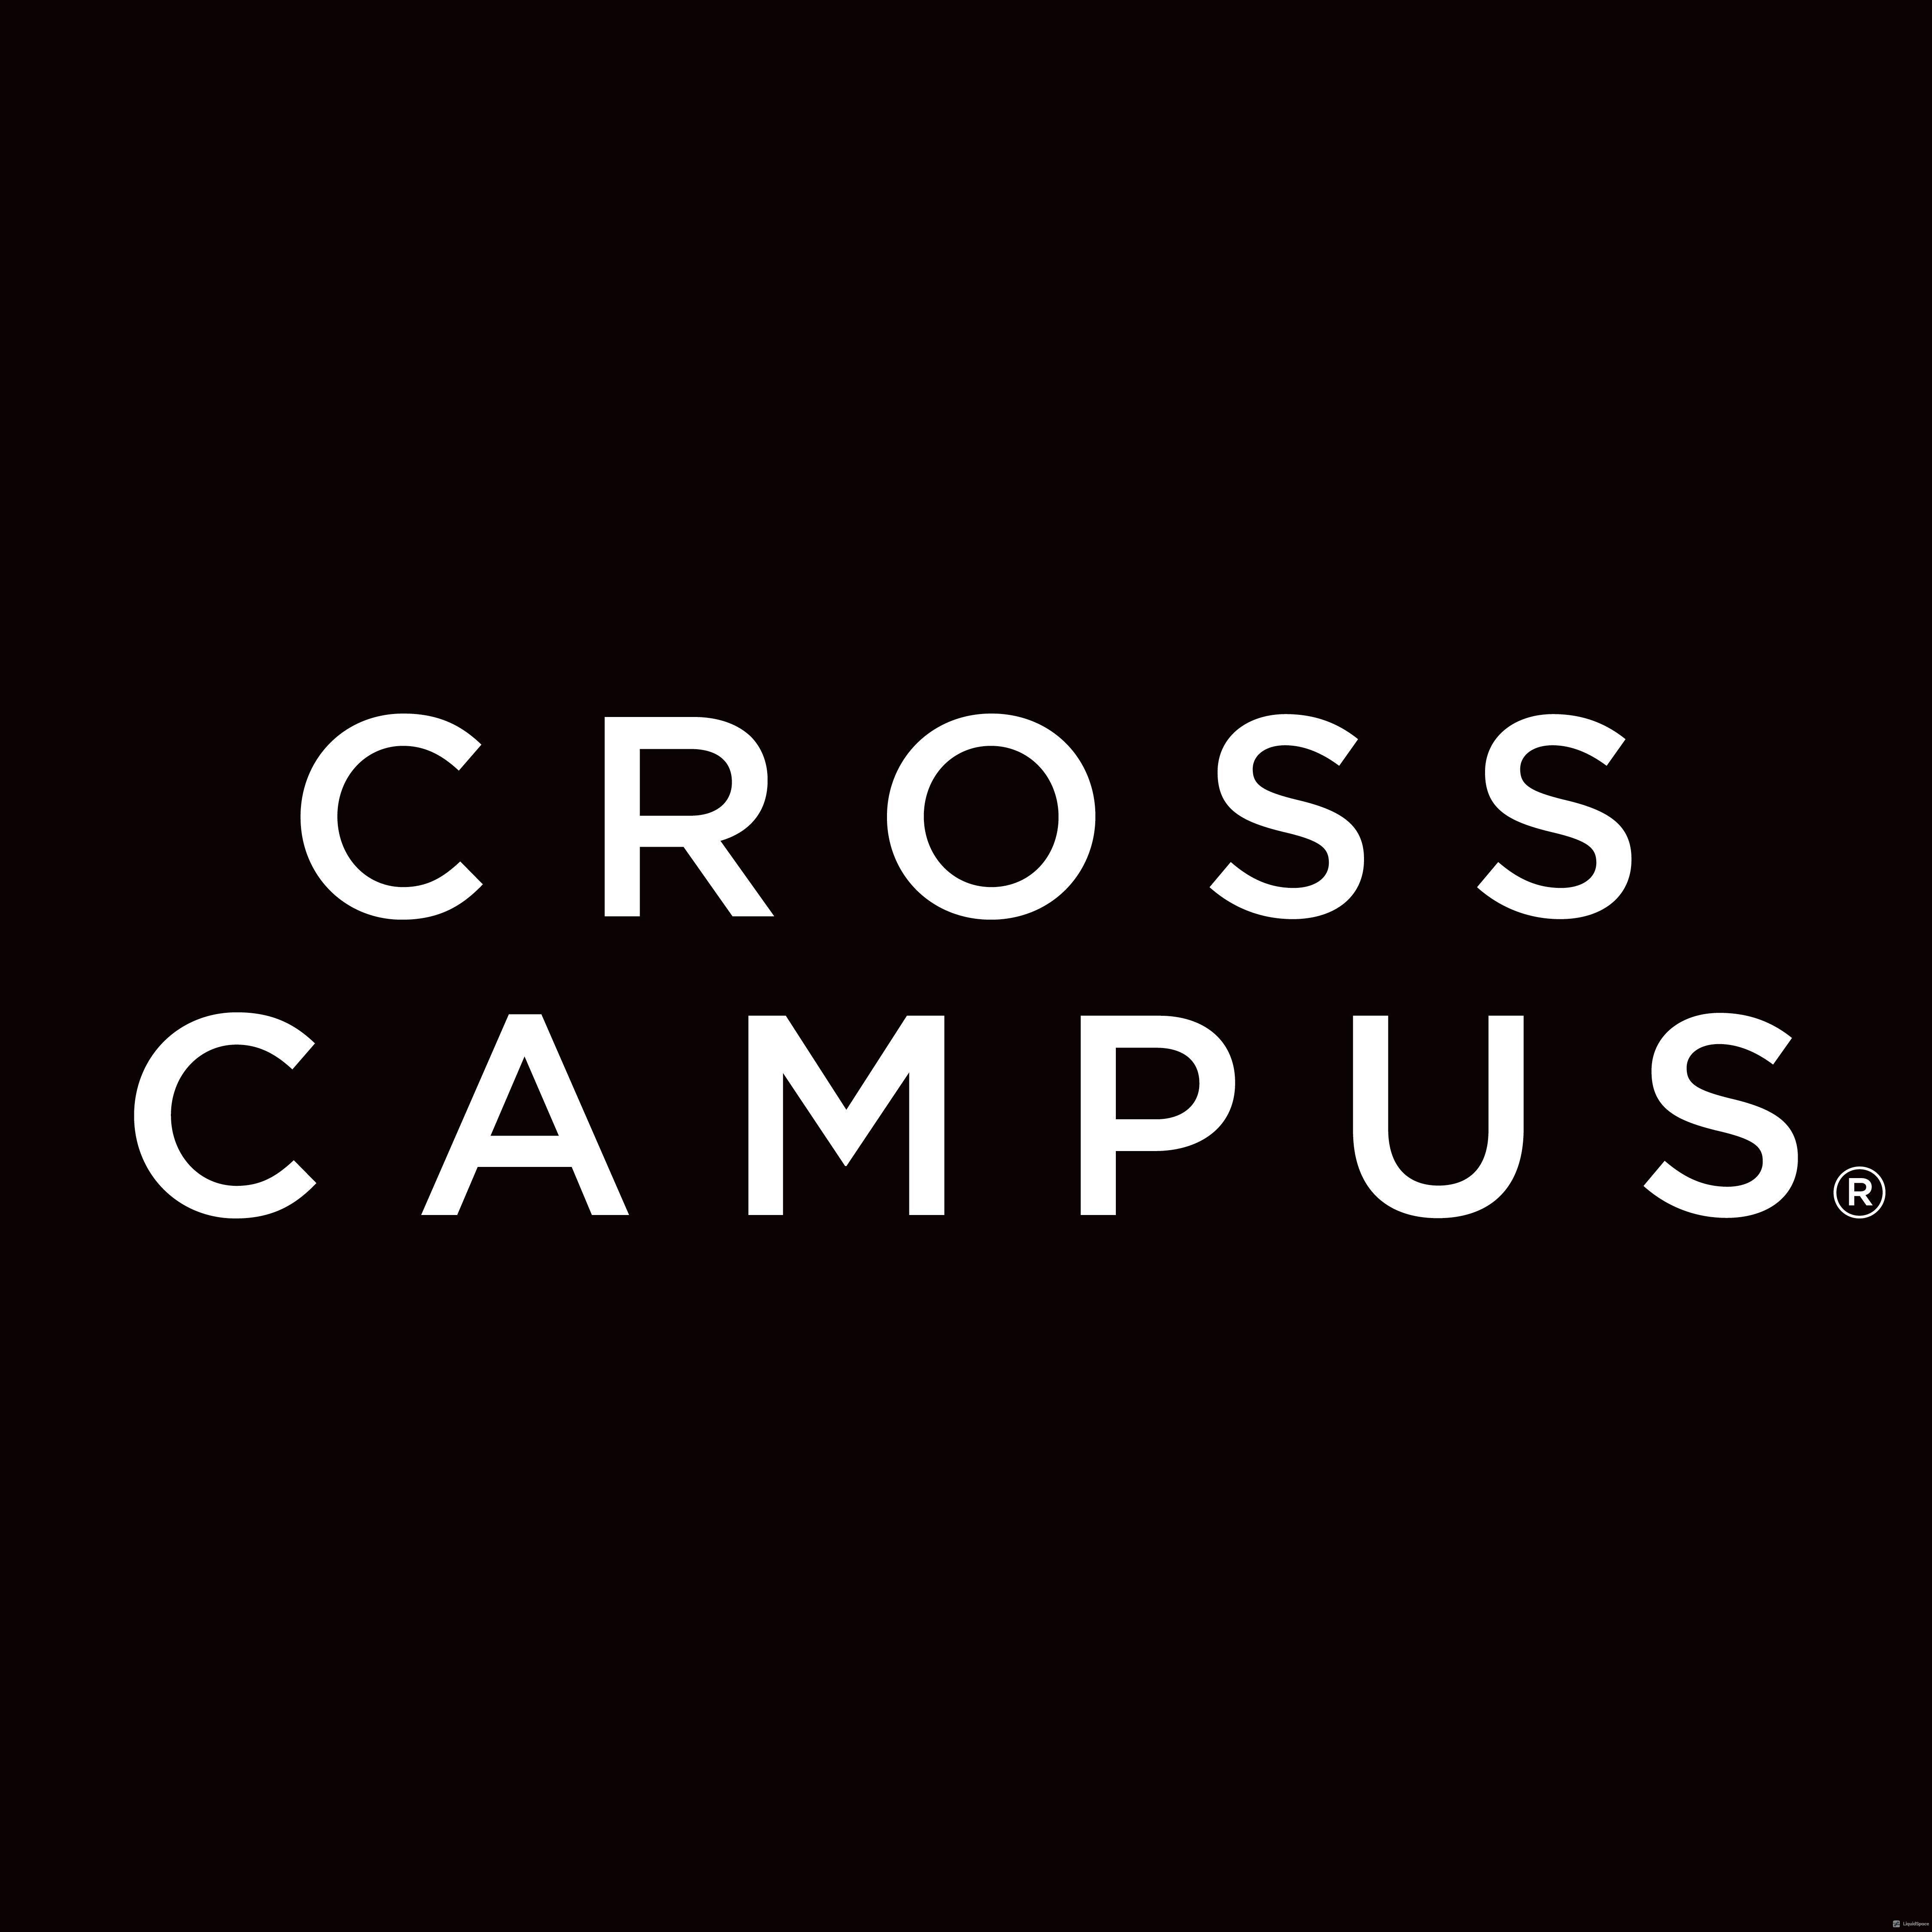 Logo of Cross Campus Downtown LA